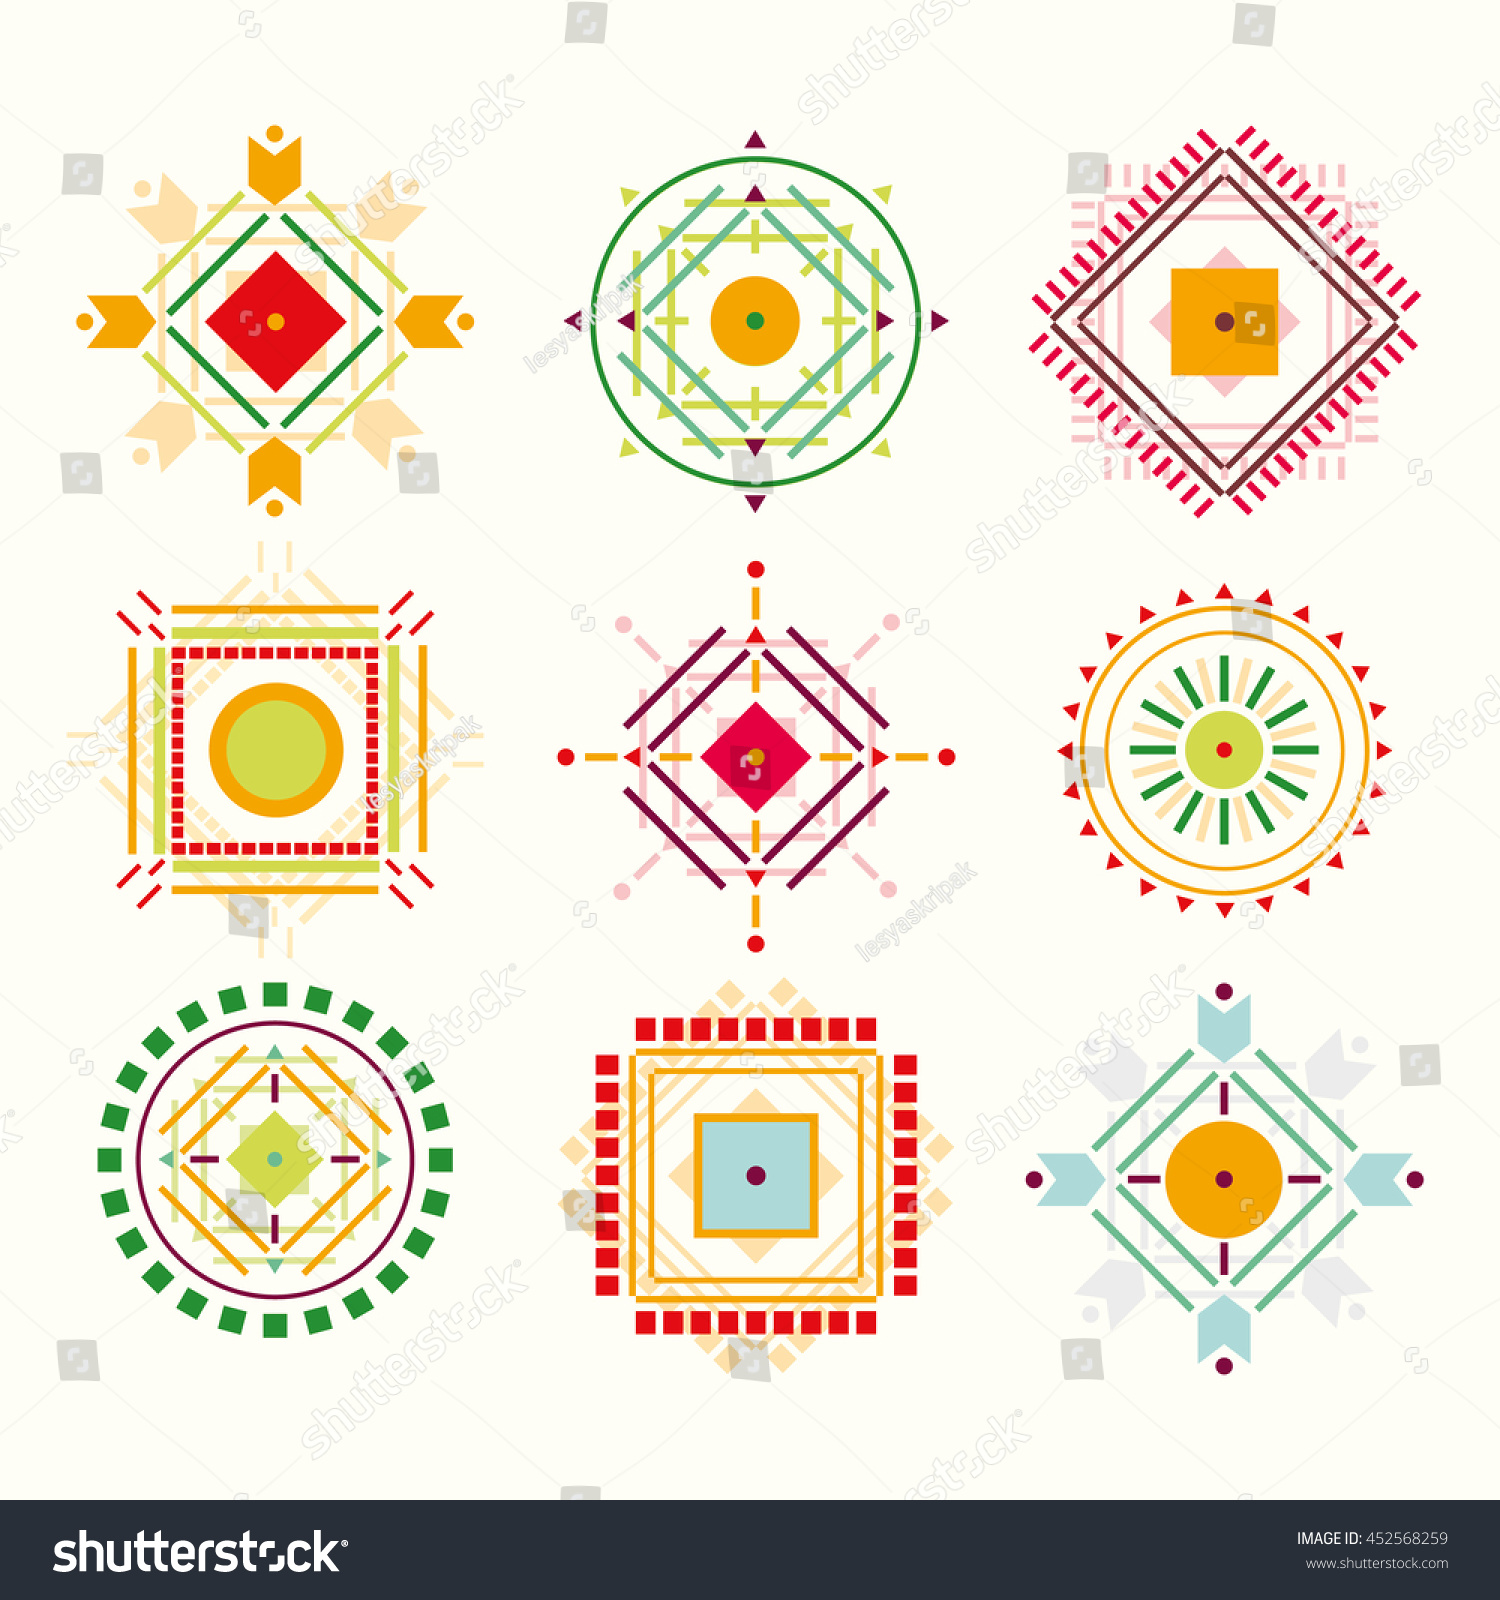 Set tribal indian elements logos symbols stock illustration set with tribal indian elements logos and symbols ethnic colorful decorations biocorpaavc Images